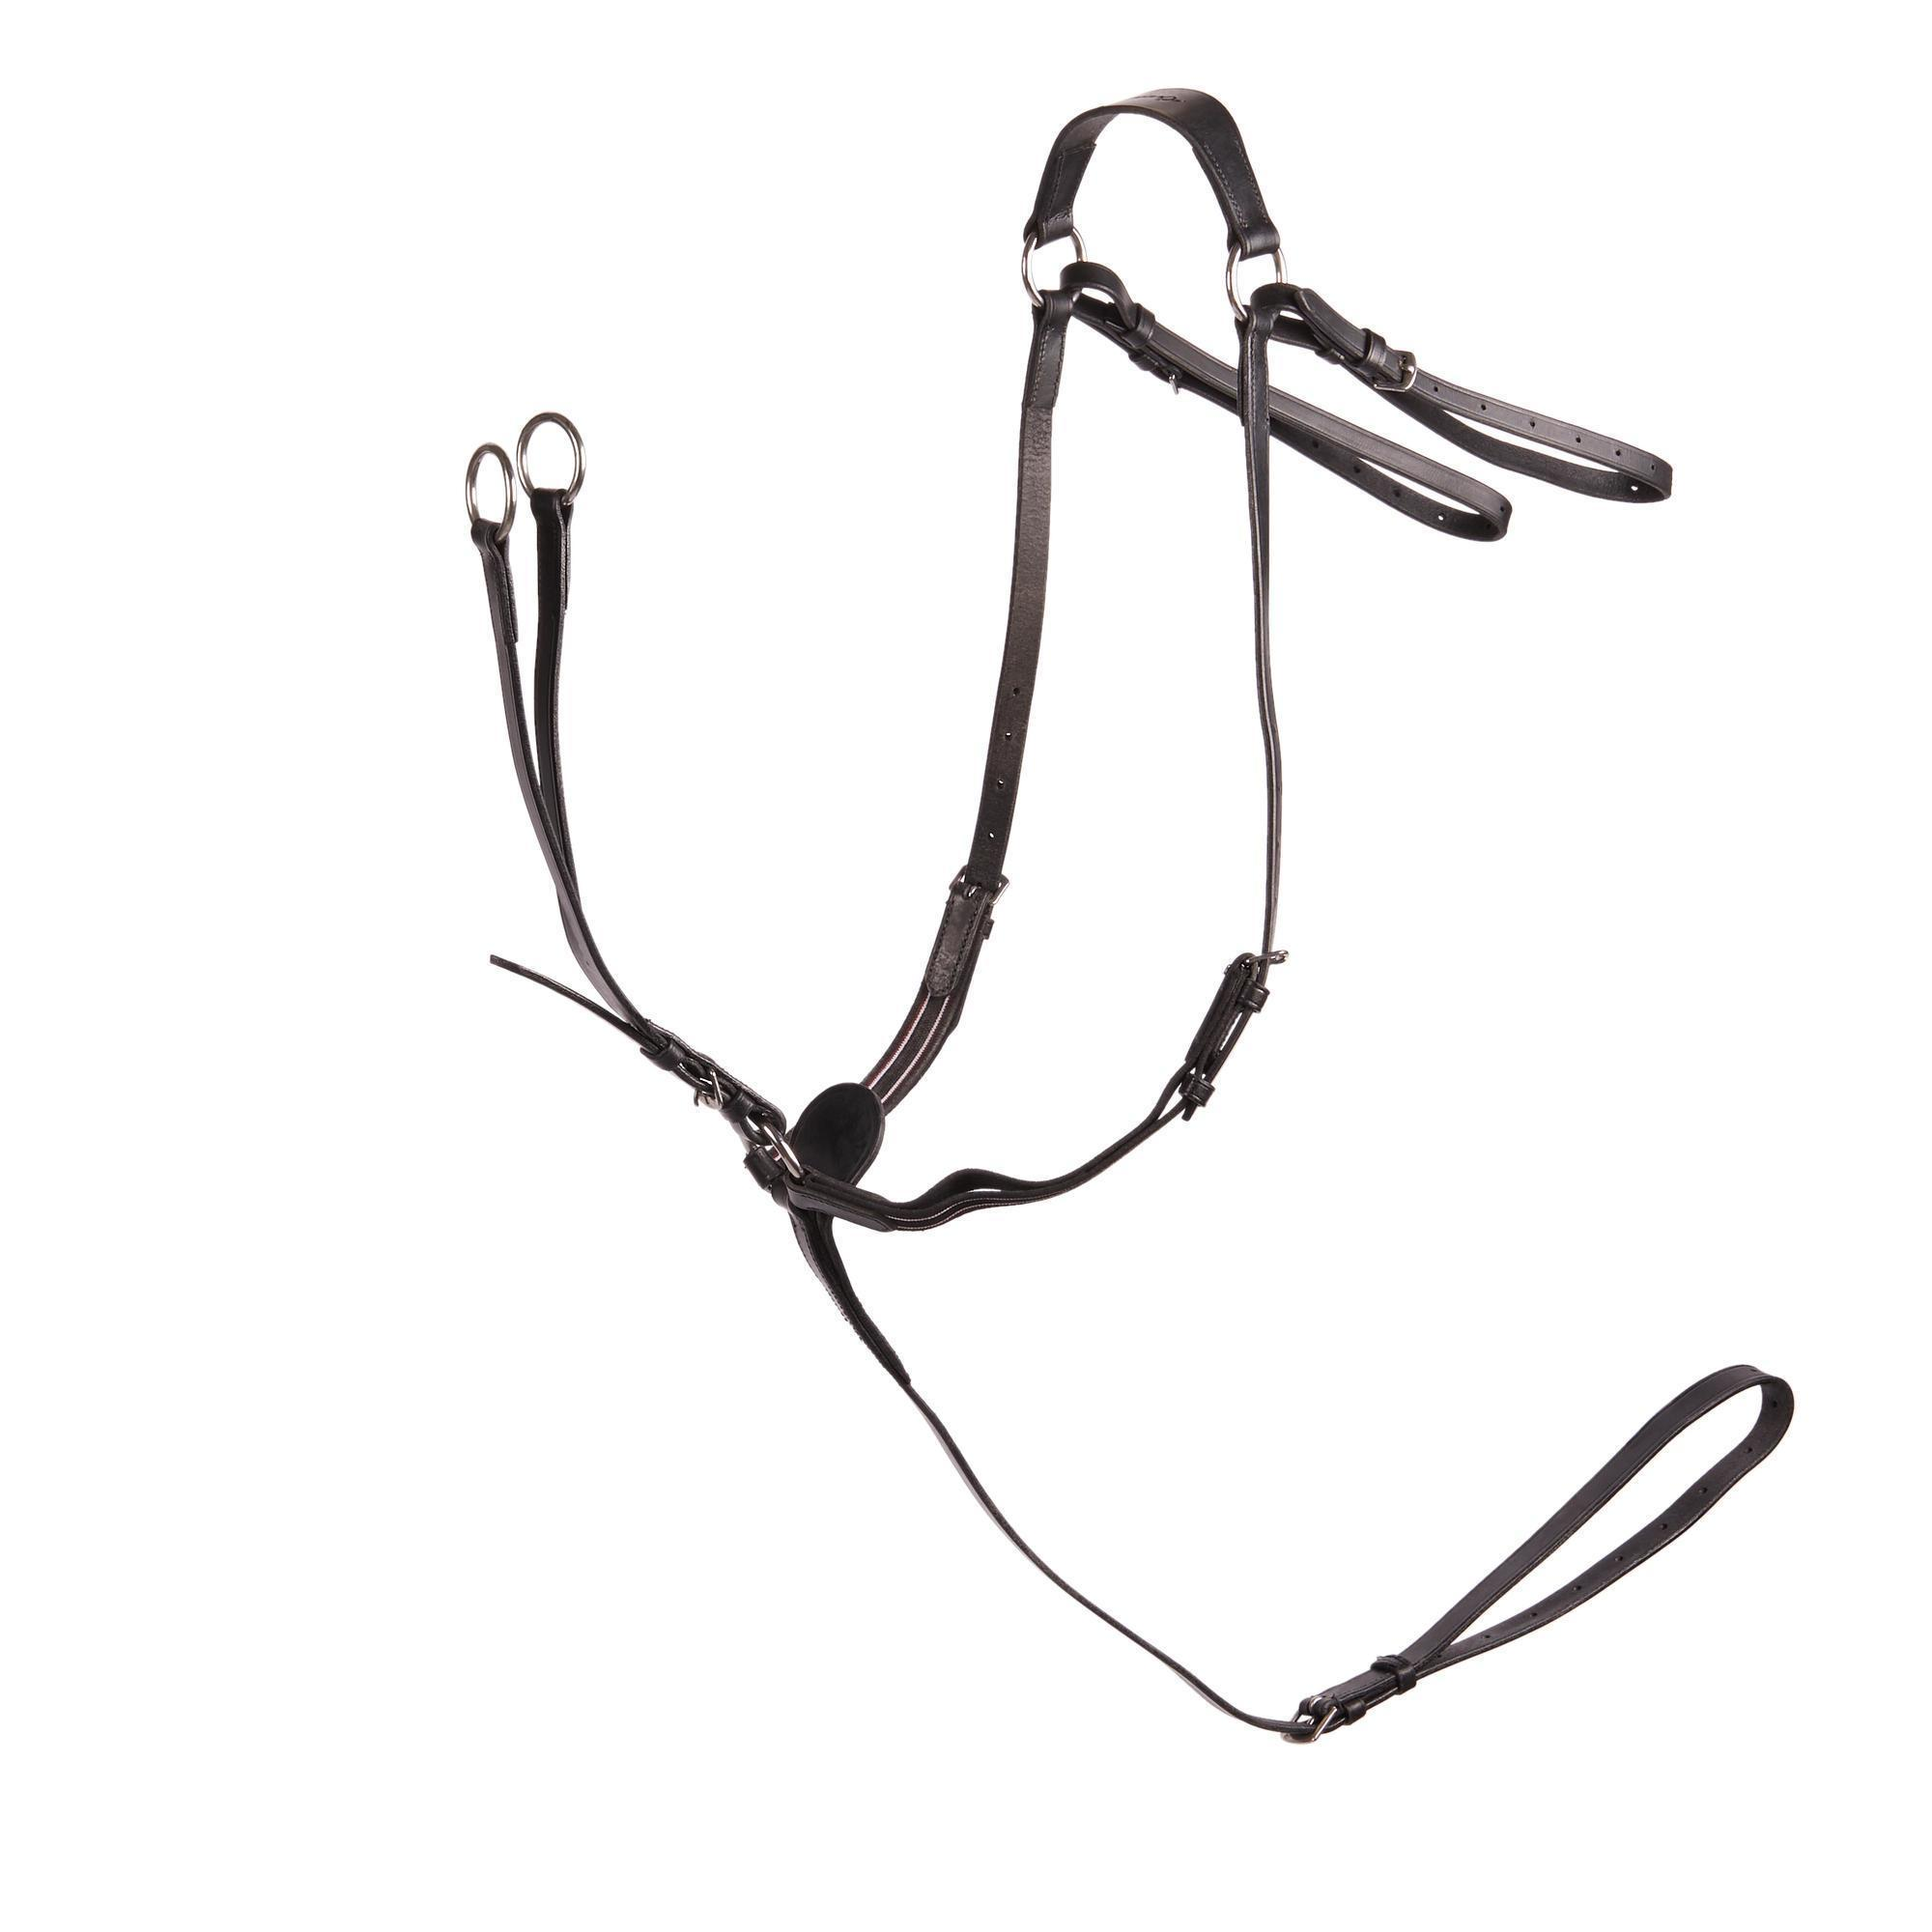 Fantastic Leather Hunting Style //Hunting Bridle Black Pony Size